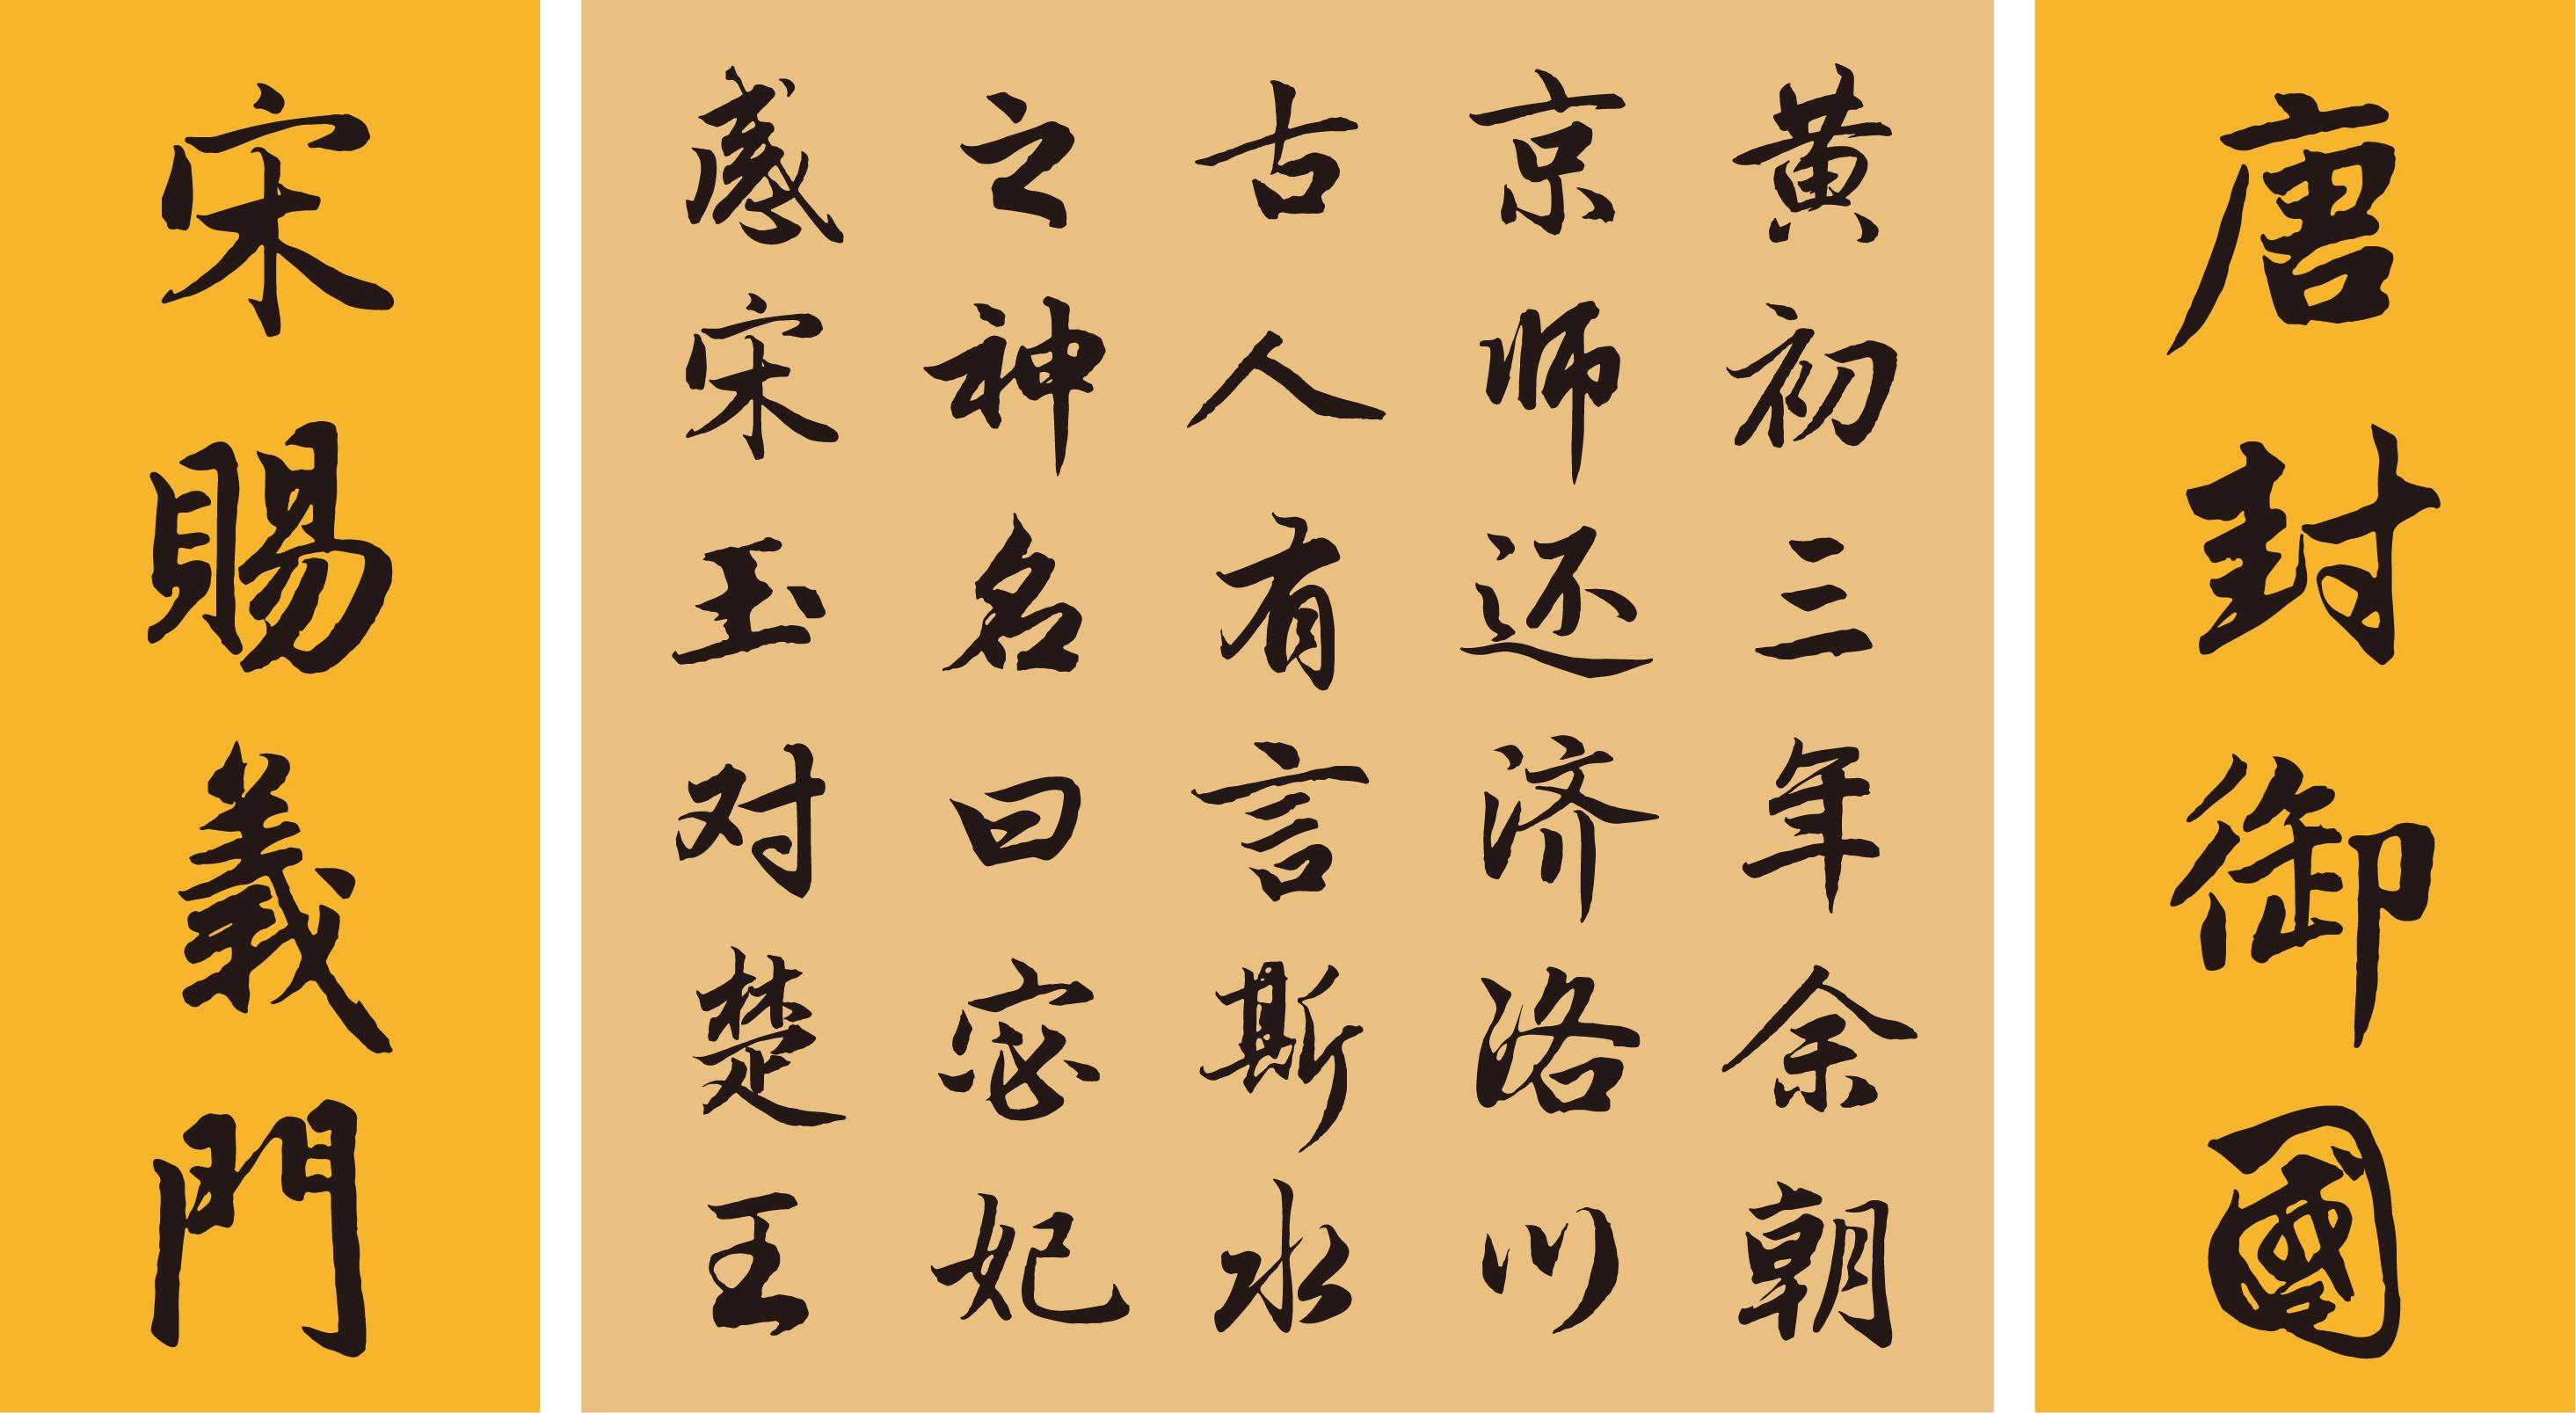 https://ft-bk1.oss-cn-zhangjiakou.aliyuncs.com/Public/Uploads/img/n_content_20201210174811_4034.png